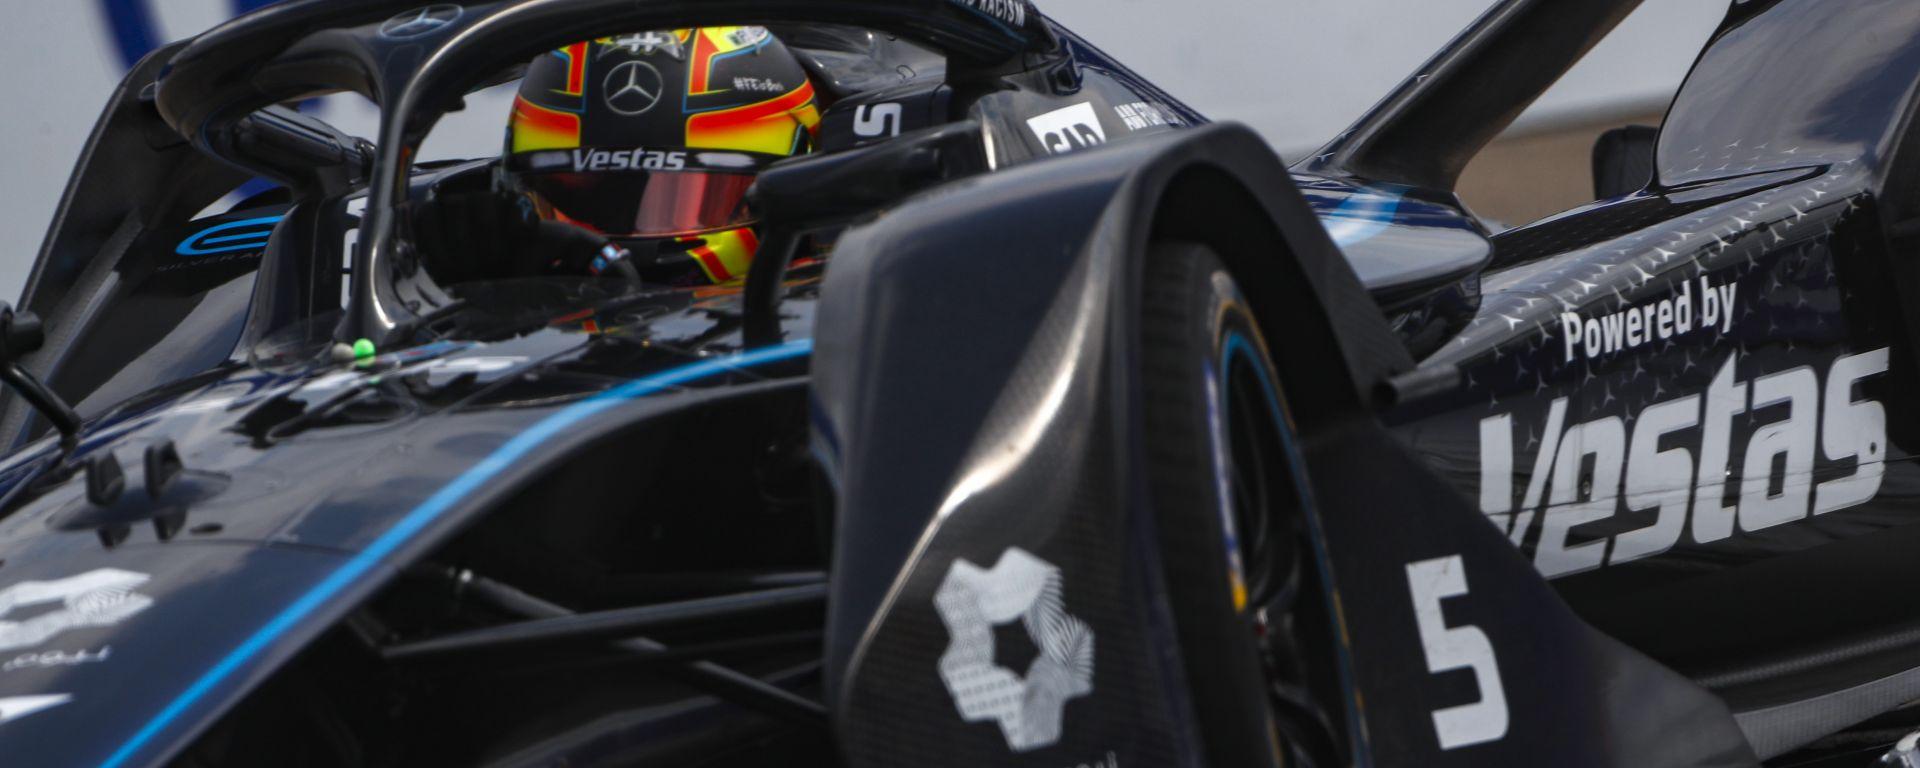 Formula E ePrix Berlino-6 2020: Stoffel Vandoorne (Mercedes)